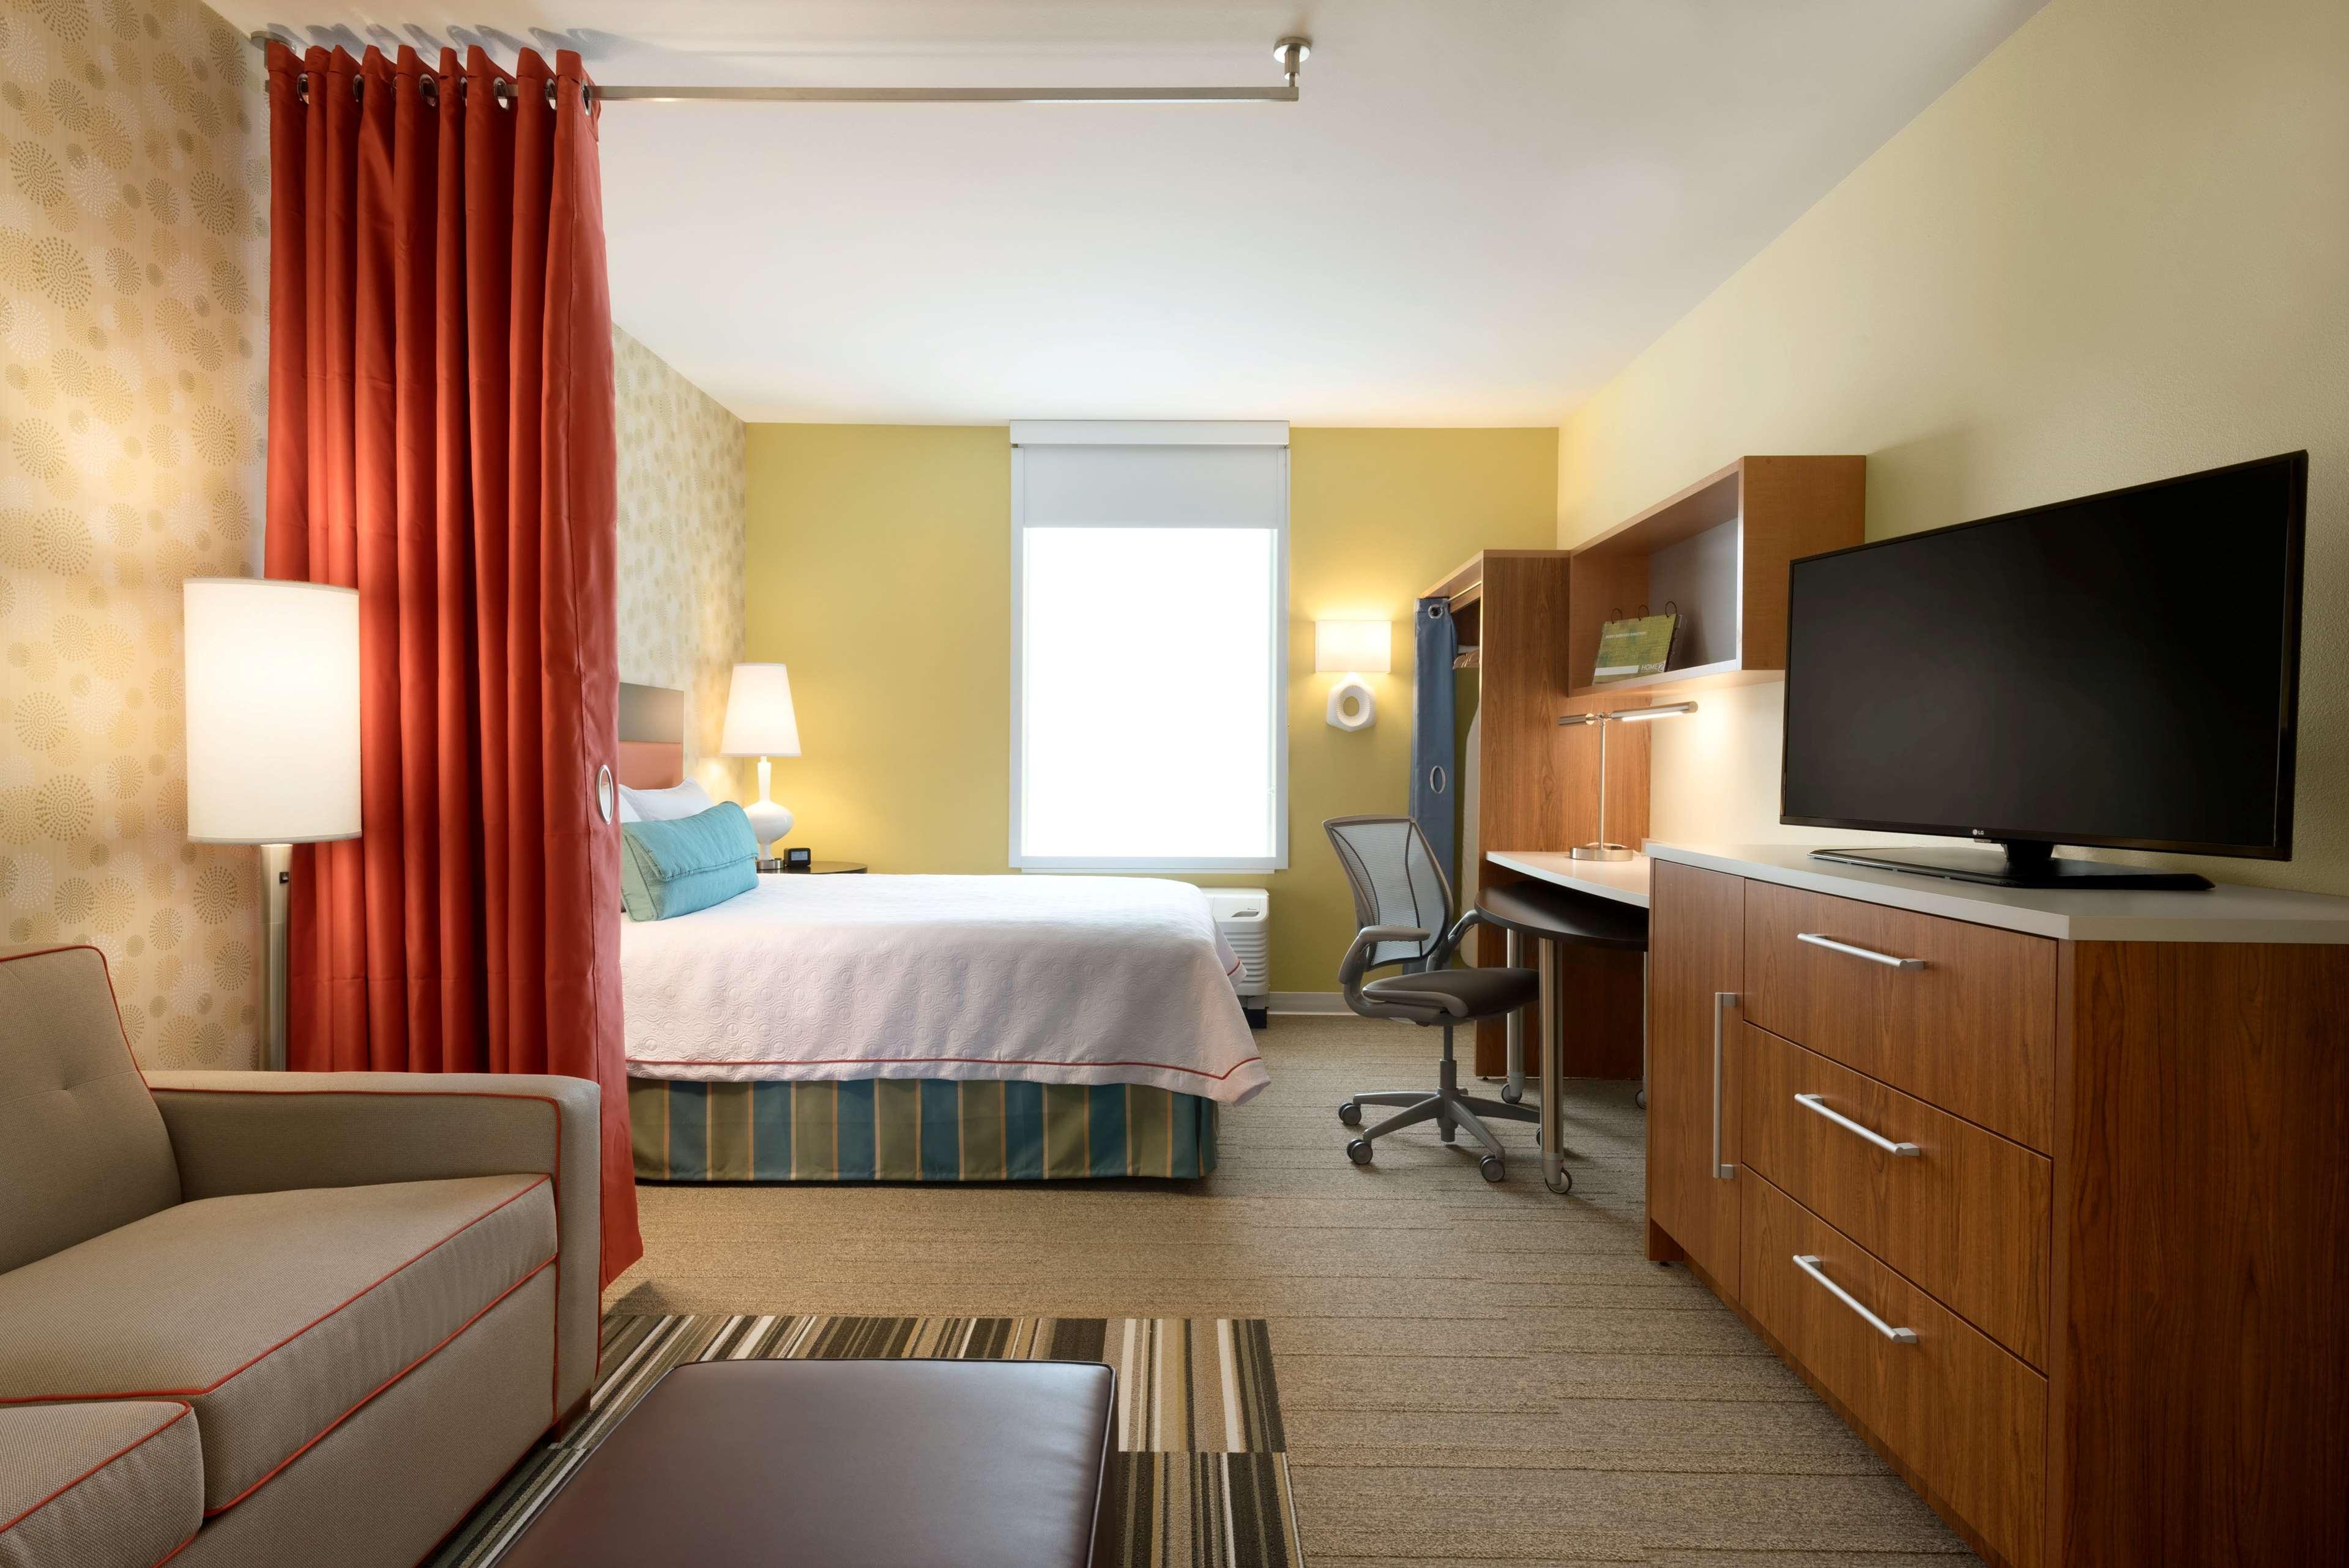 Home2 Suites by Hilton Roseville Minneapolis image 0